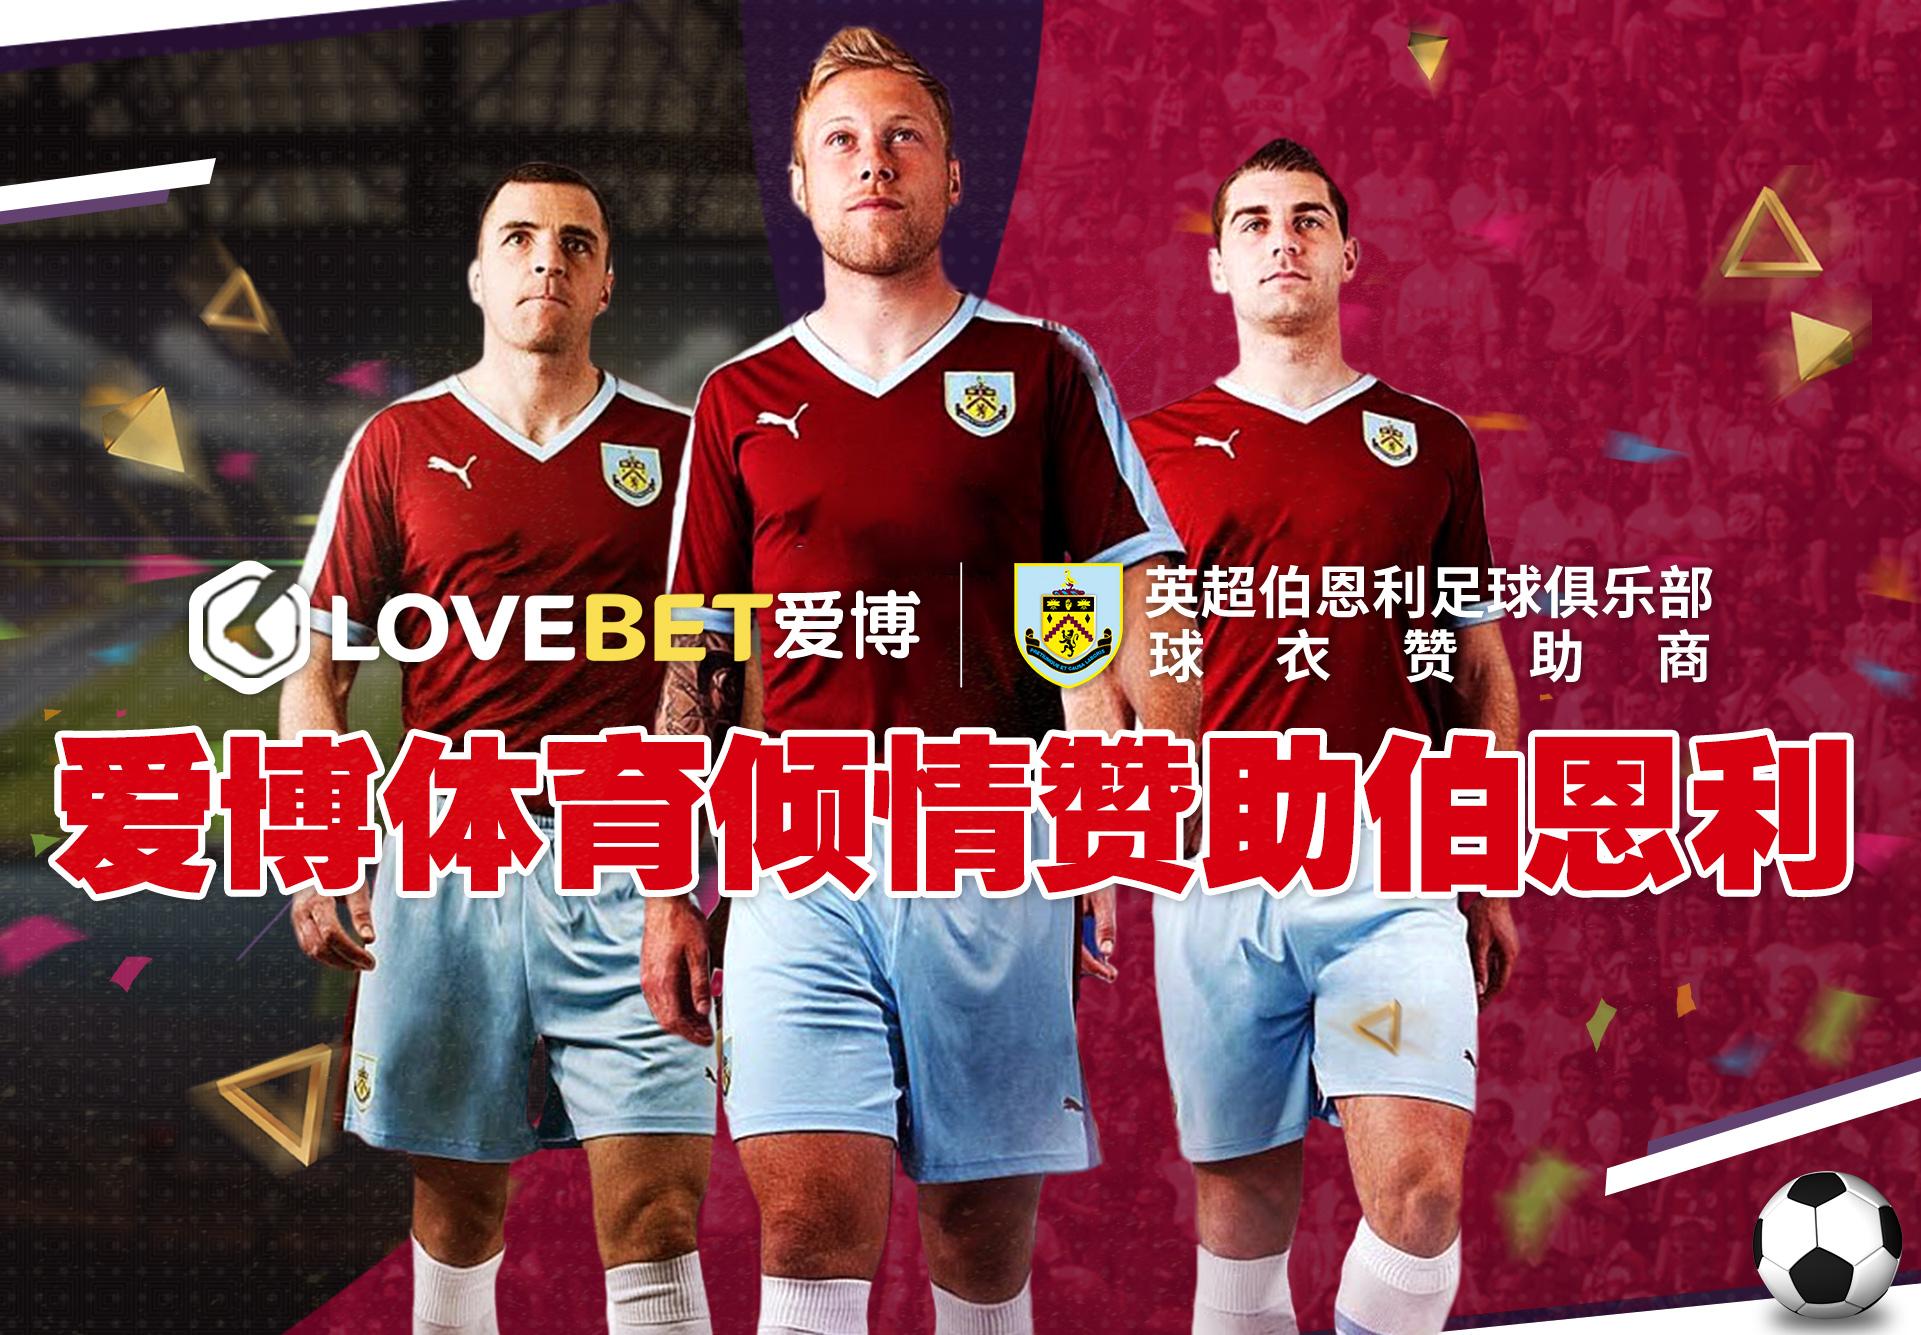 LoveBet爱博正式成为伯恩利足球俱乐部球衣赞助商